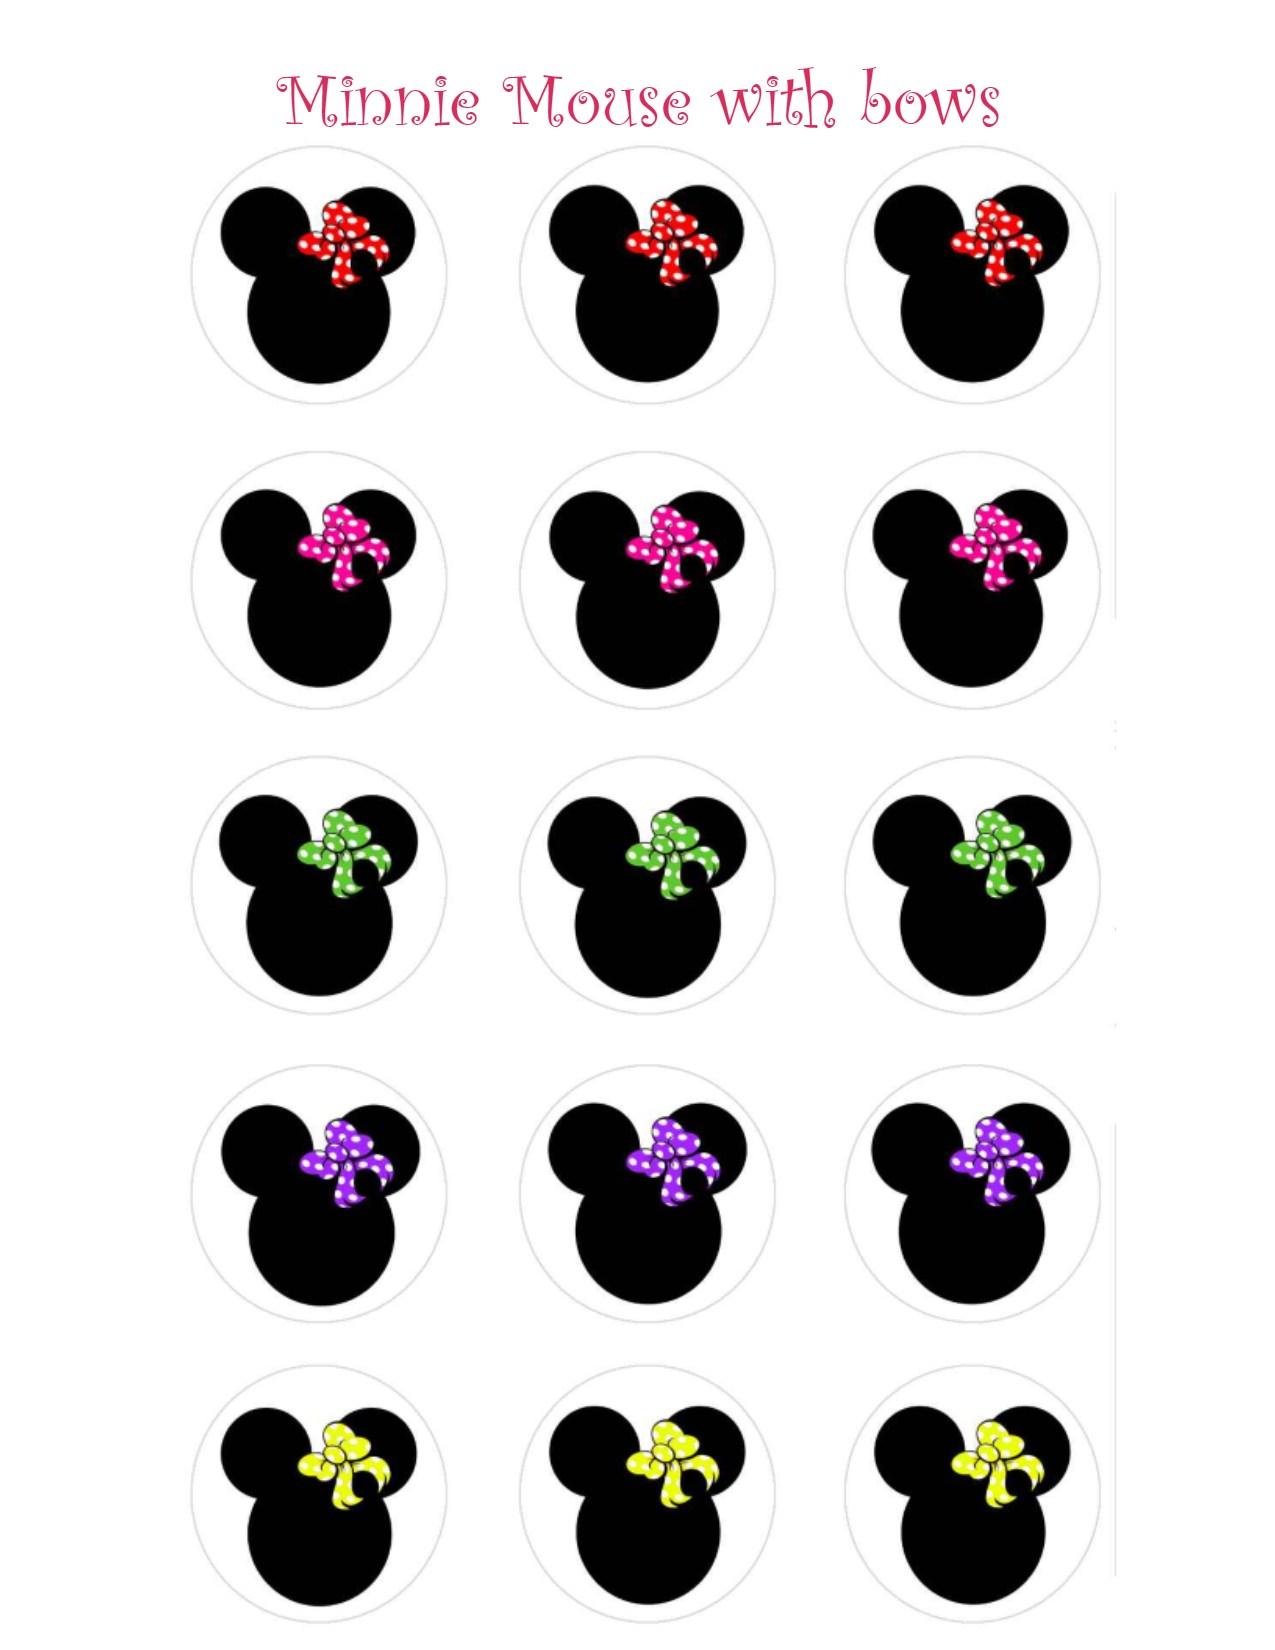 photo regarding Printable Minnie Mouse Bows known as Totally free Printable Minnie Mouse Bow Contentment Studio Style and design Gallery